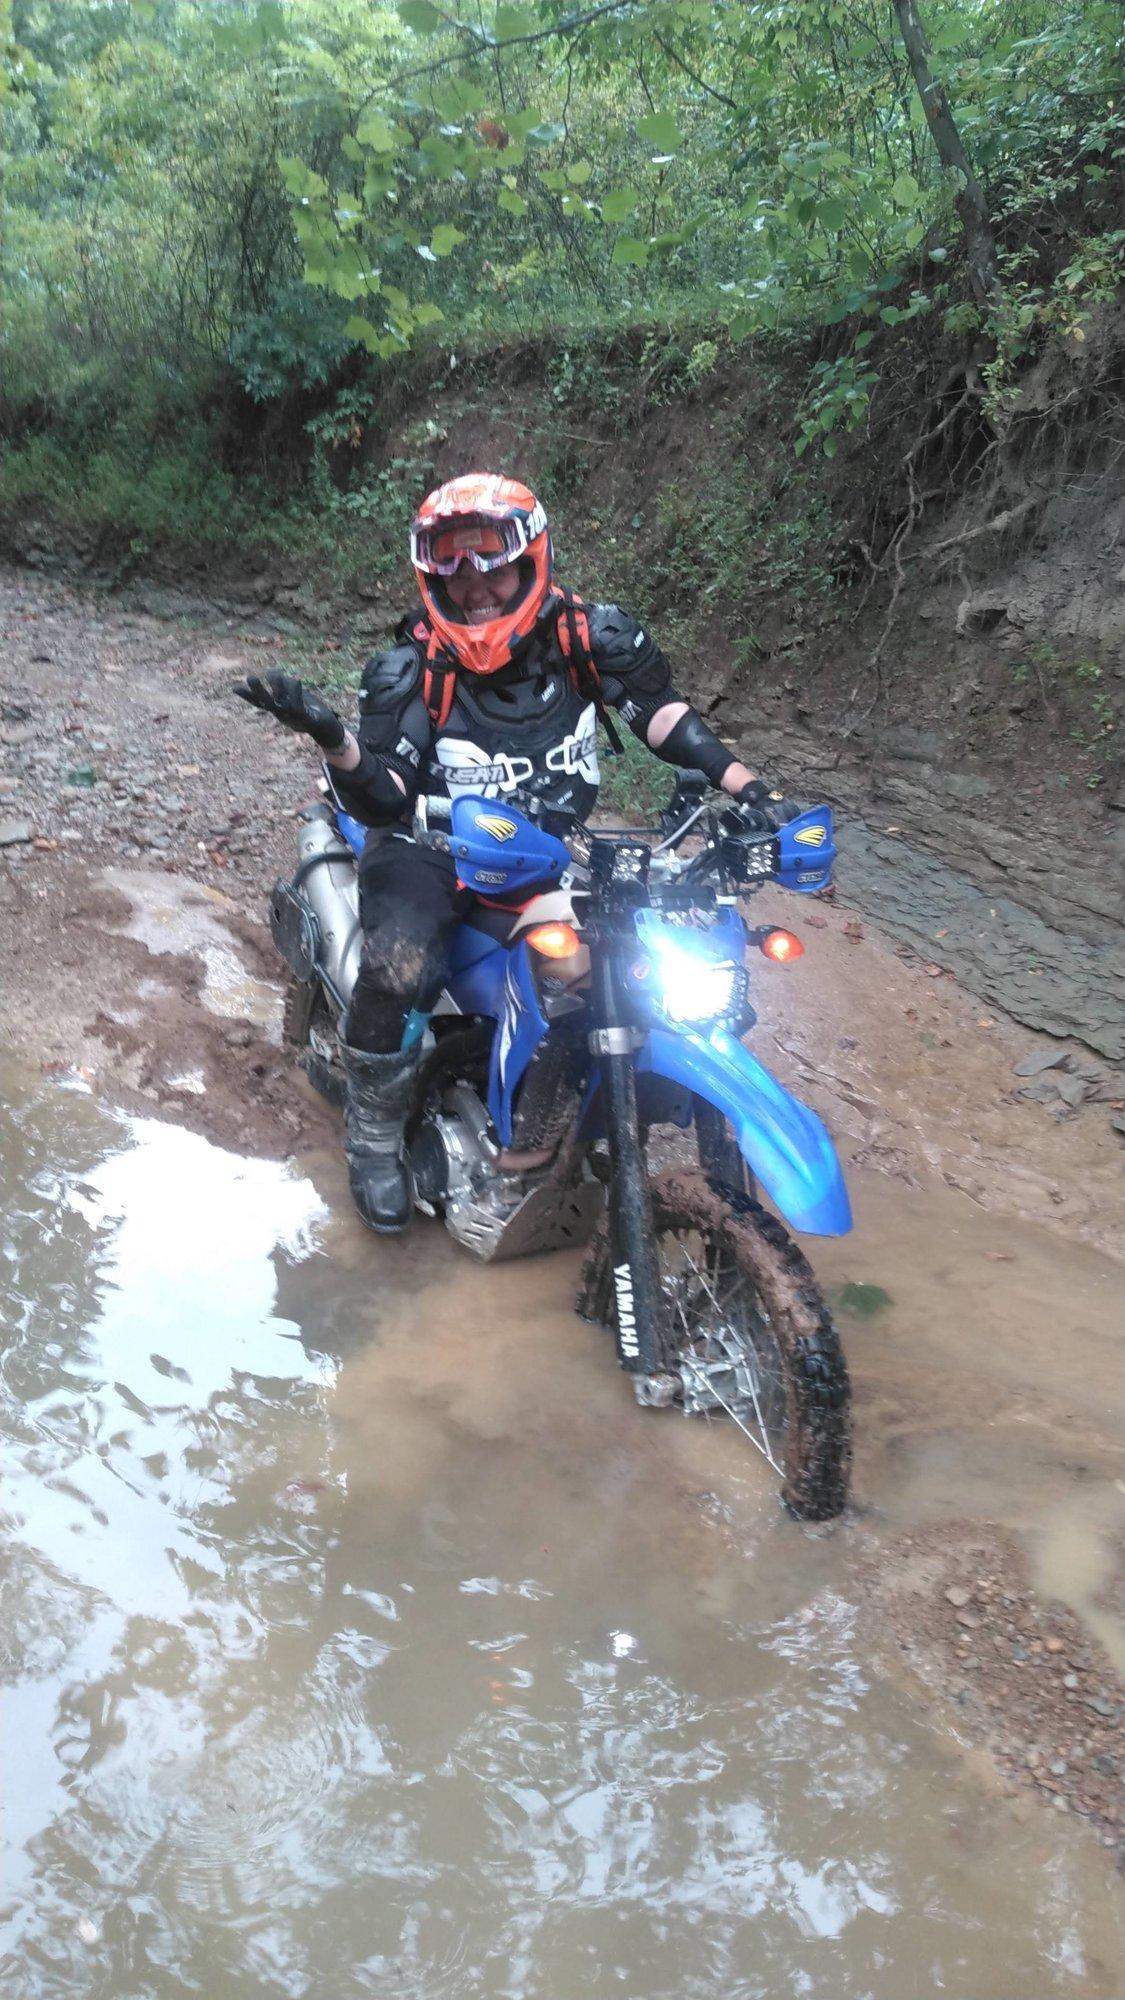 moto now what.jpg